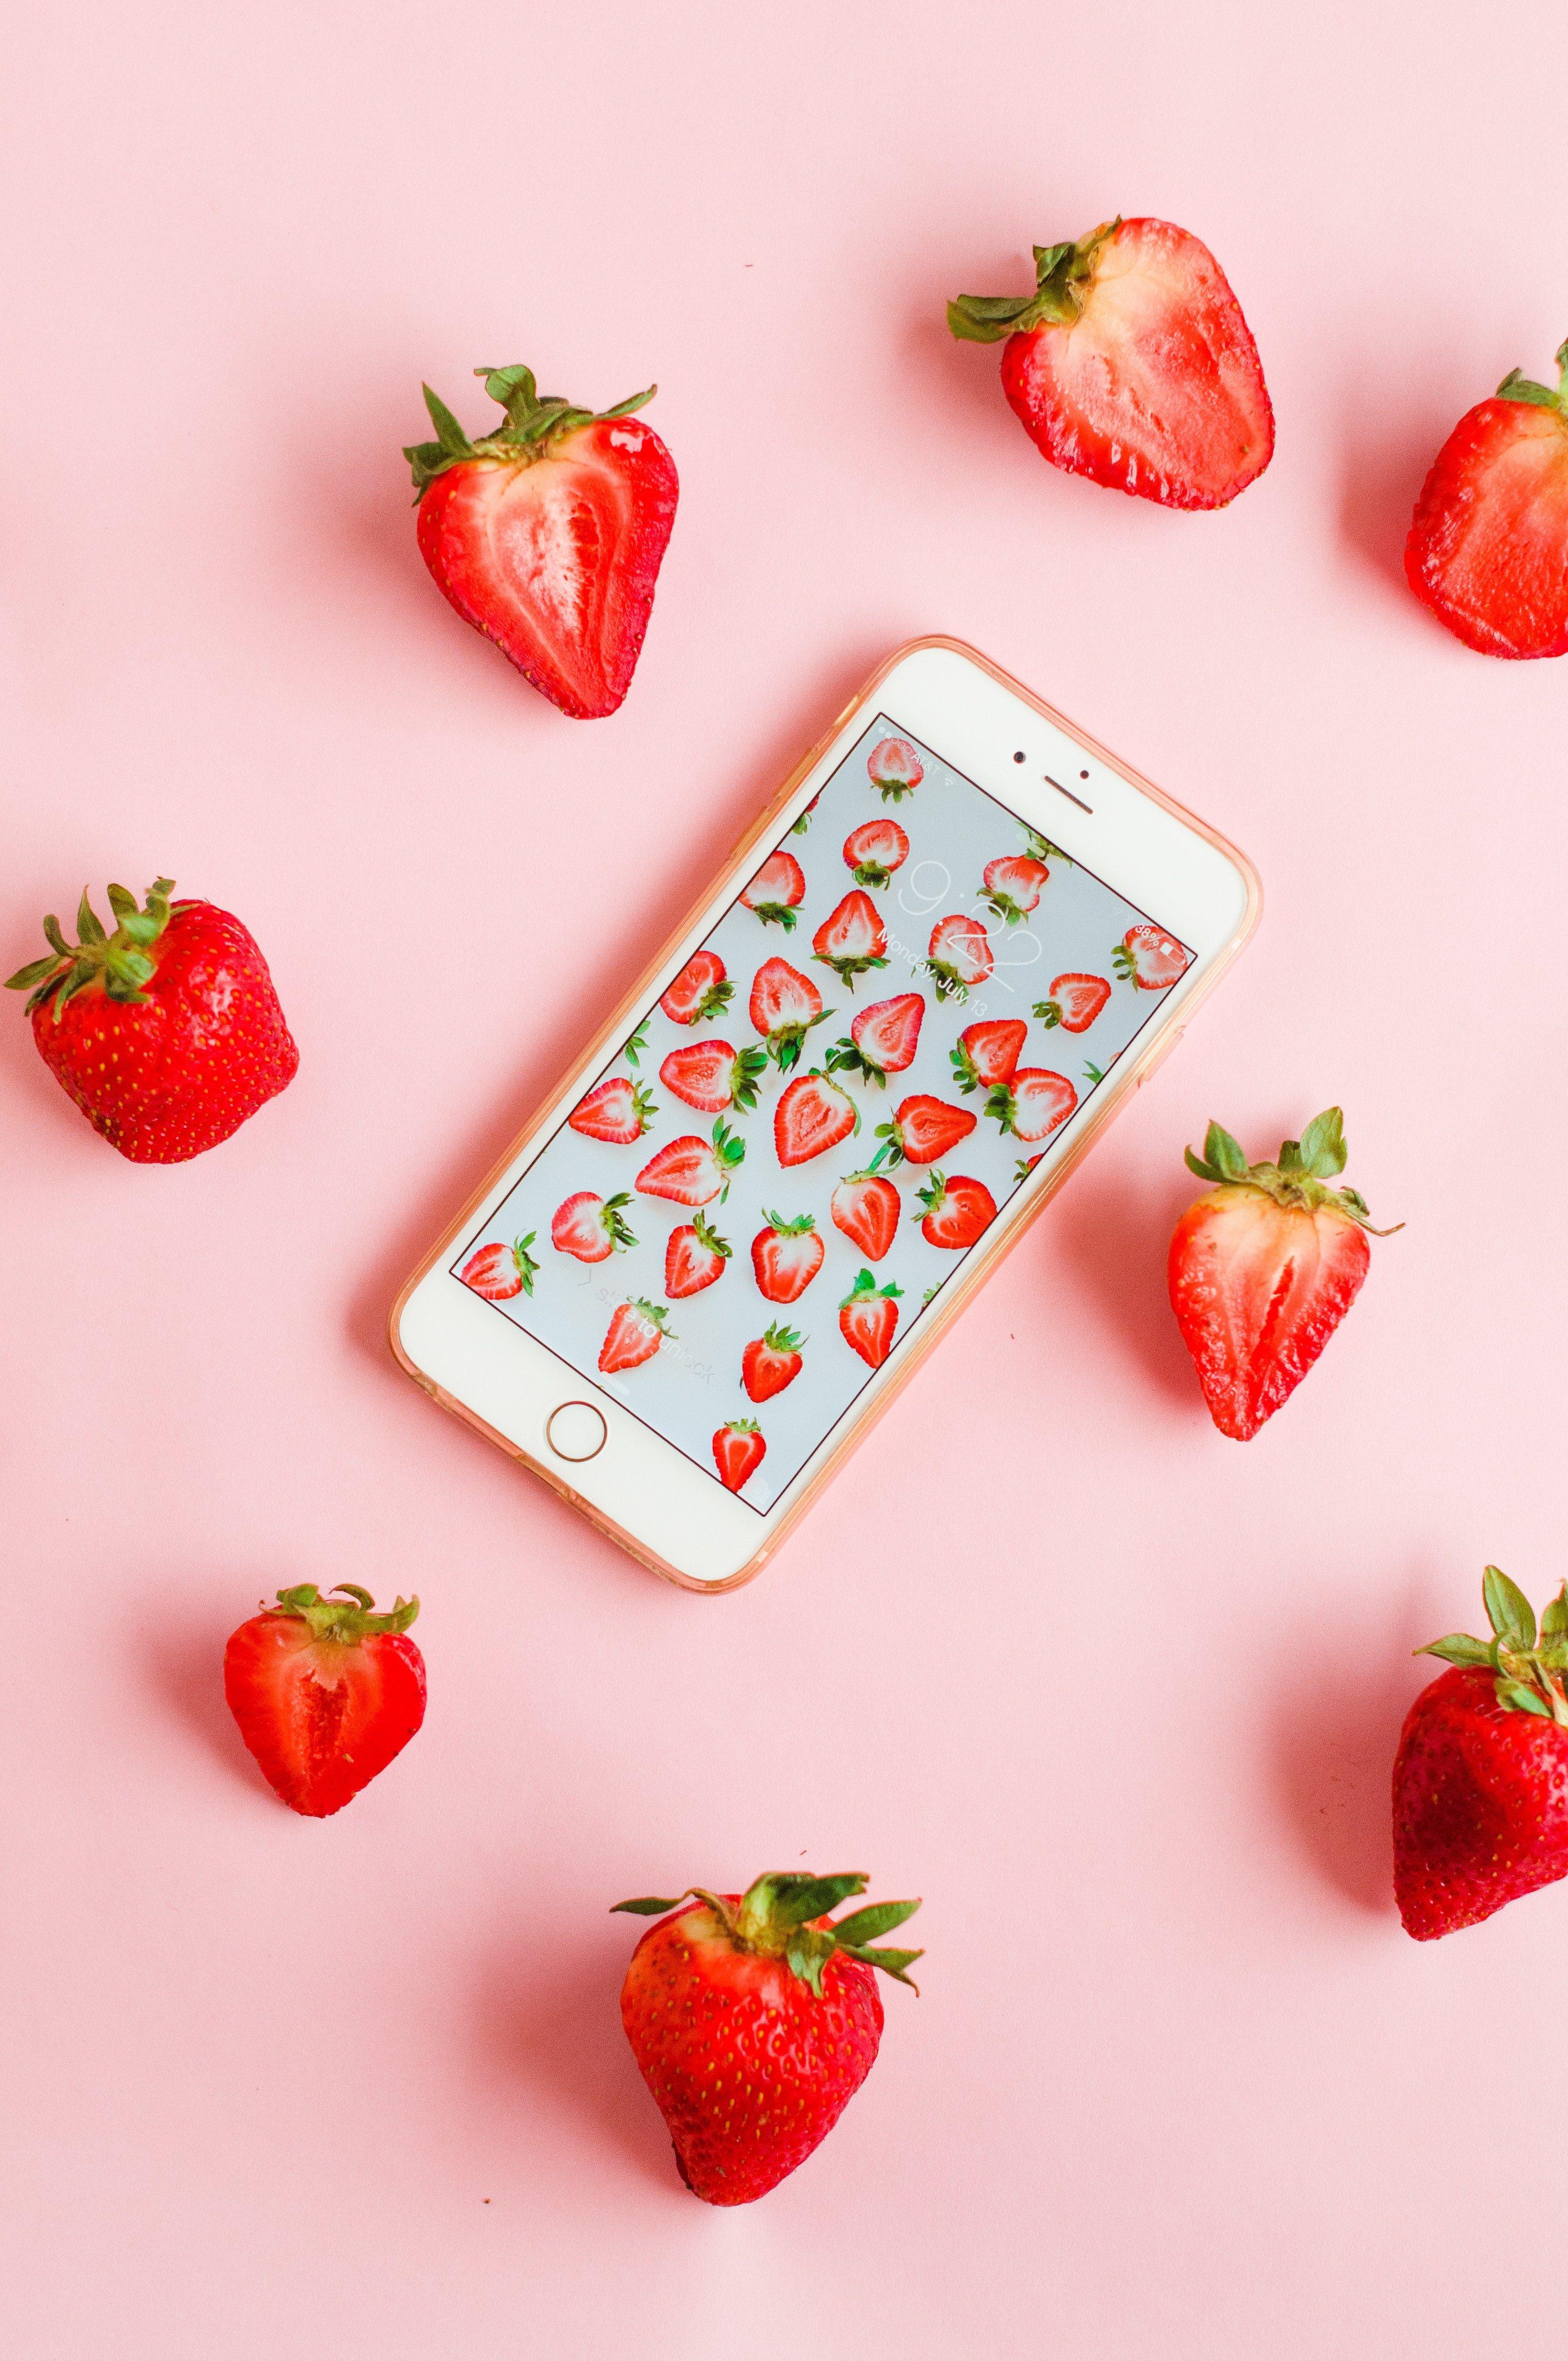 Printed Strawberry Wallpaper Download A New Series Proper Stroberi Buah Wallpaper Ponsel